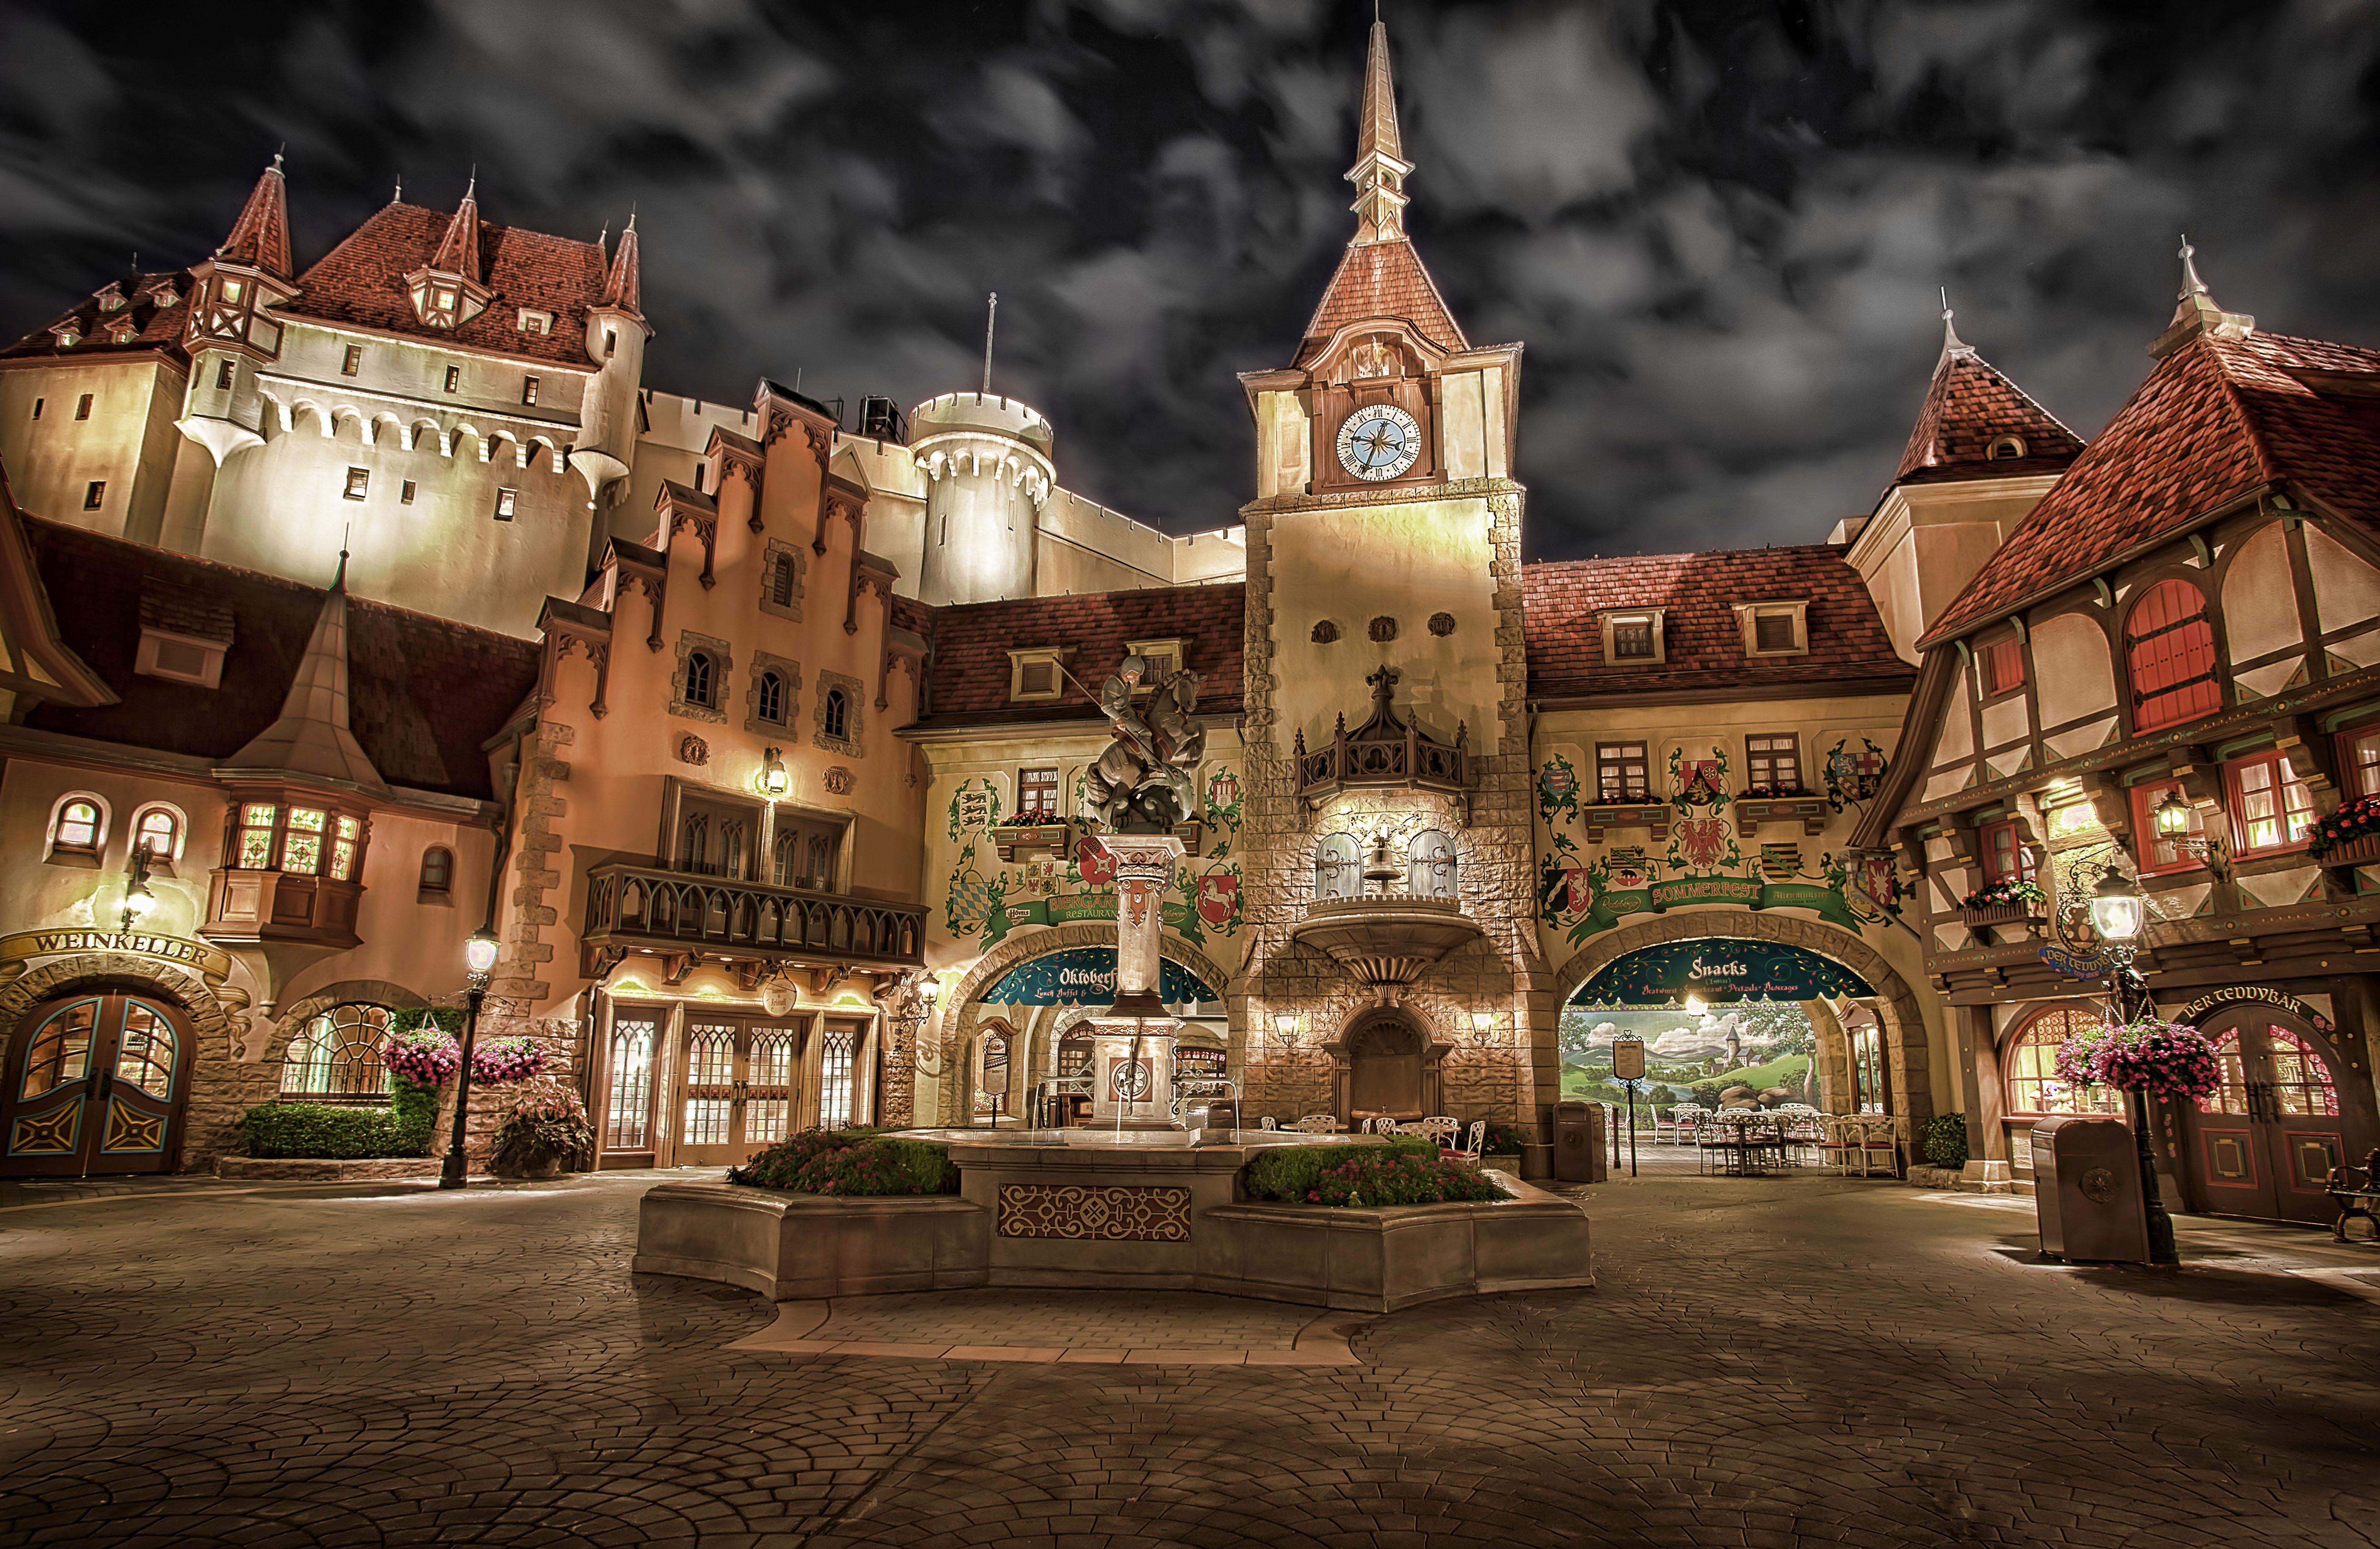 Walt Disney World Resorts Wallpaper - WallpaperSafari